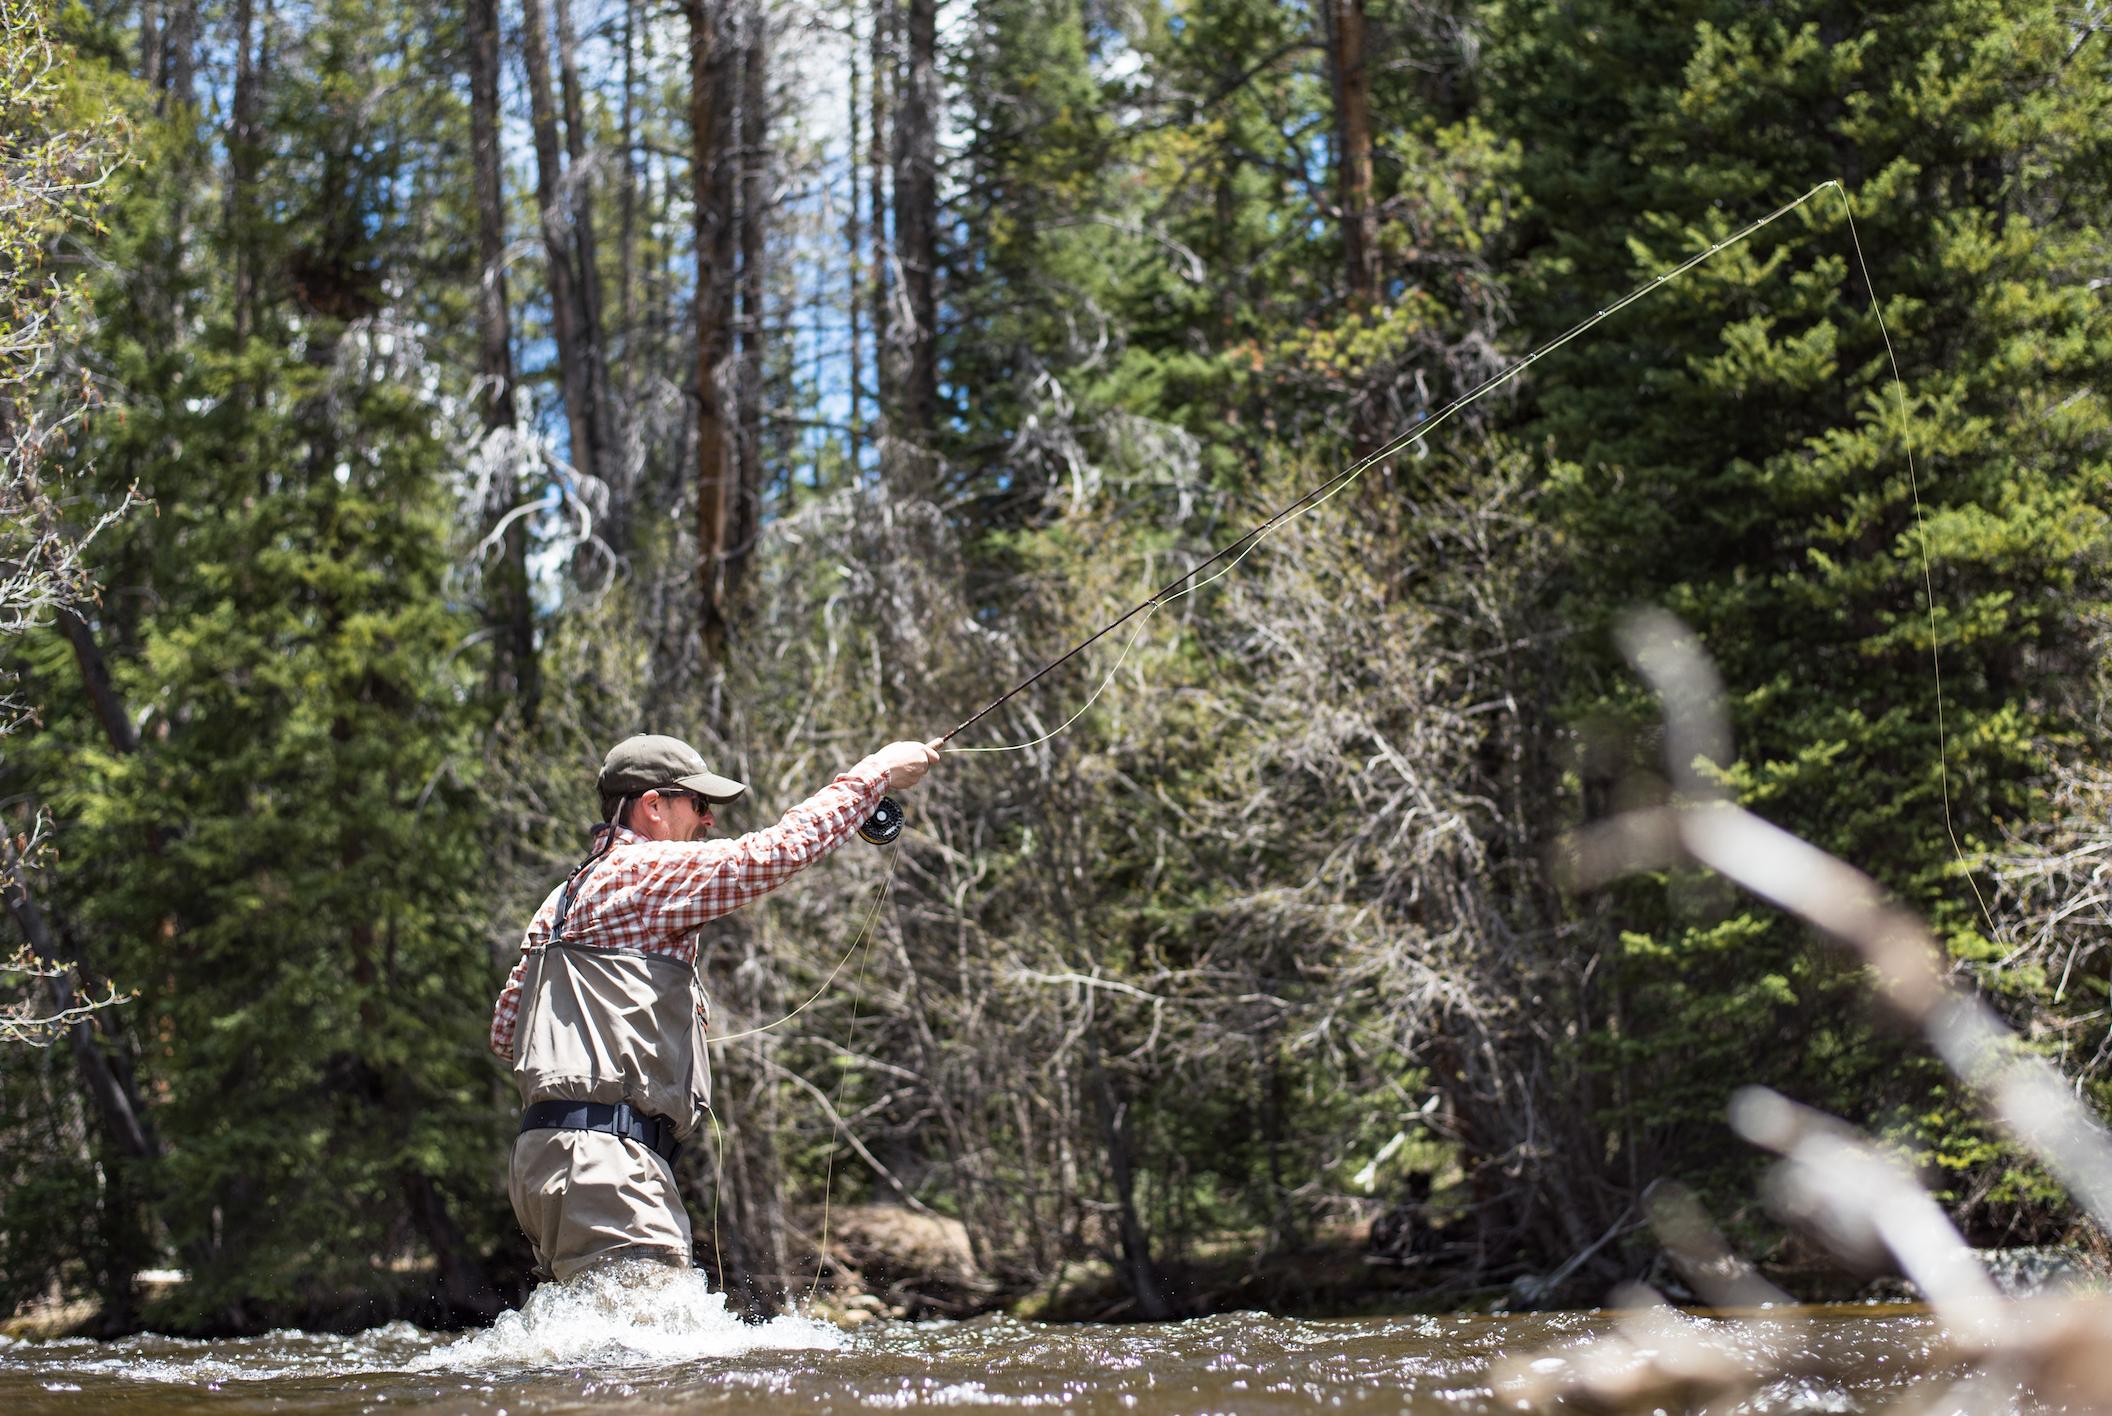 Gore Creek Fishing Report | Colorado Fishing Conditions & Flows